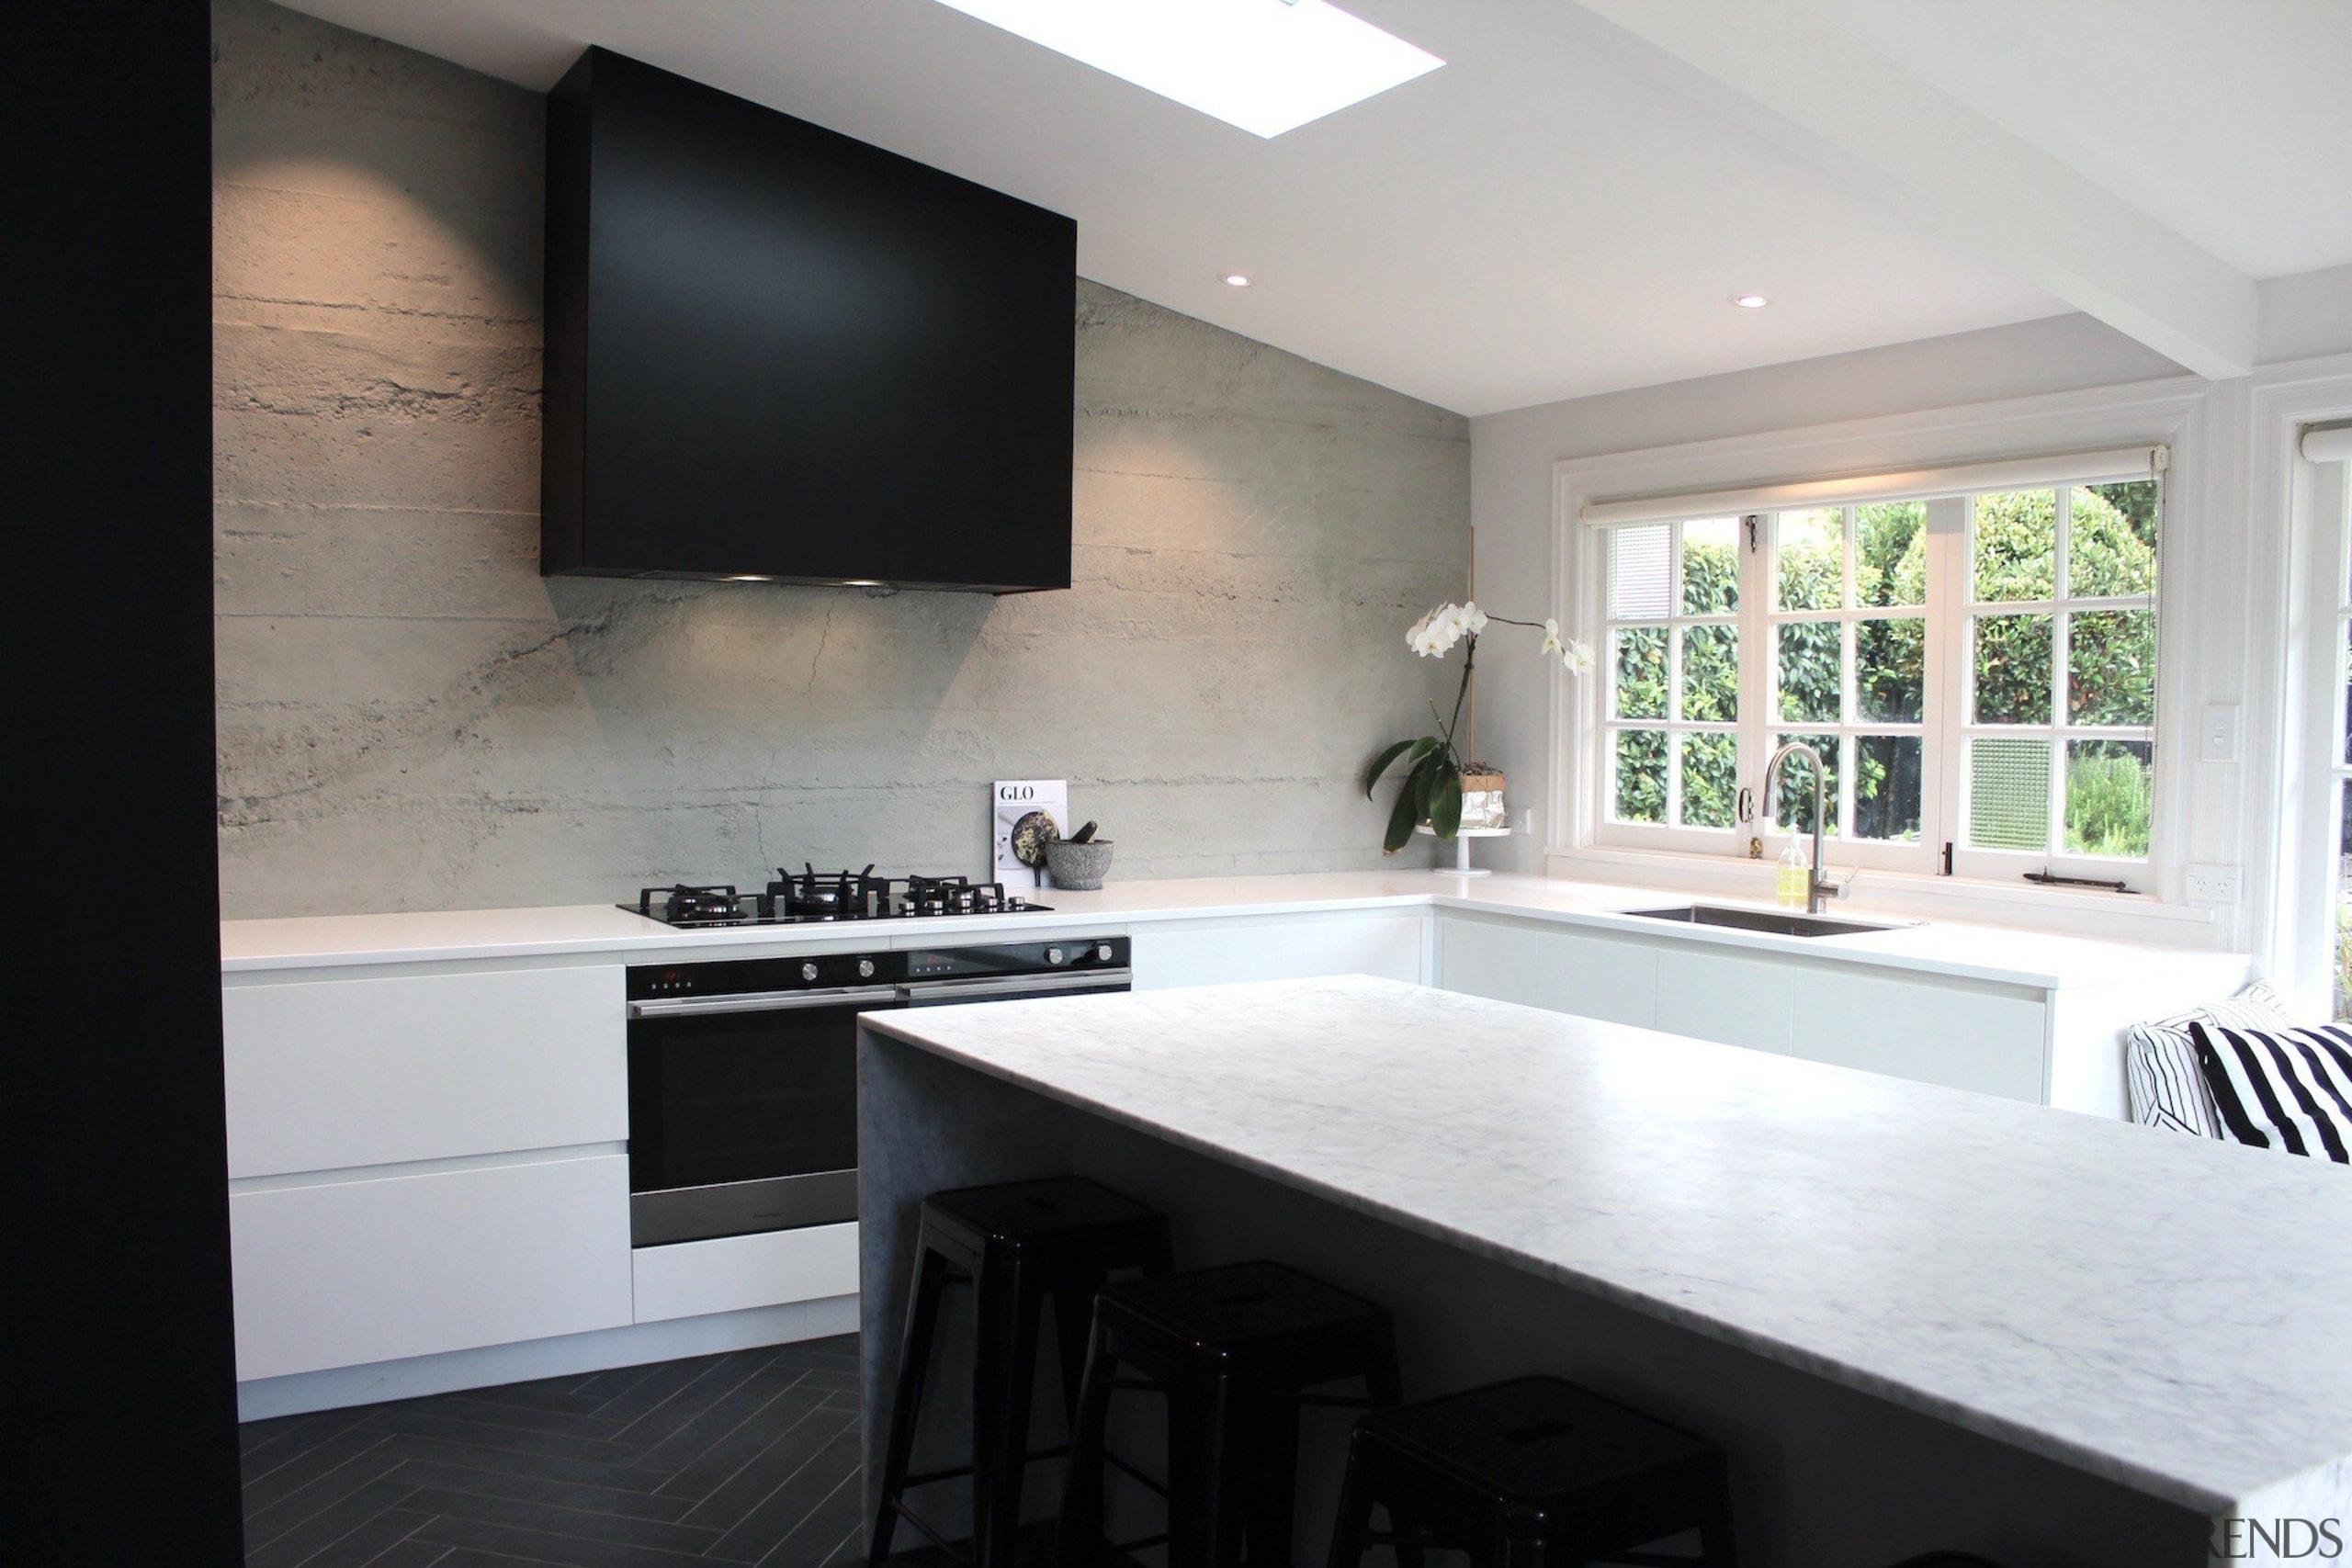 Evelyn McNamara Architects – TIDA New Zealand architecture, countertop, interior design, kitchen, real estate, room, window, gray, black, white